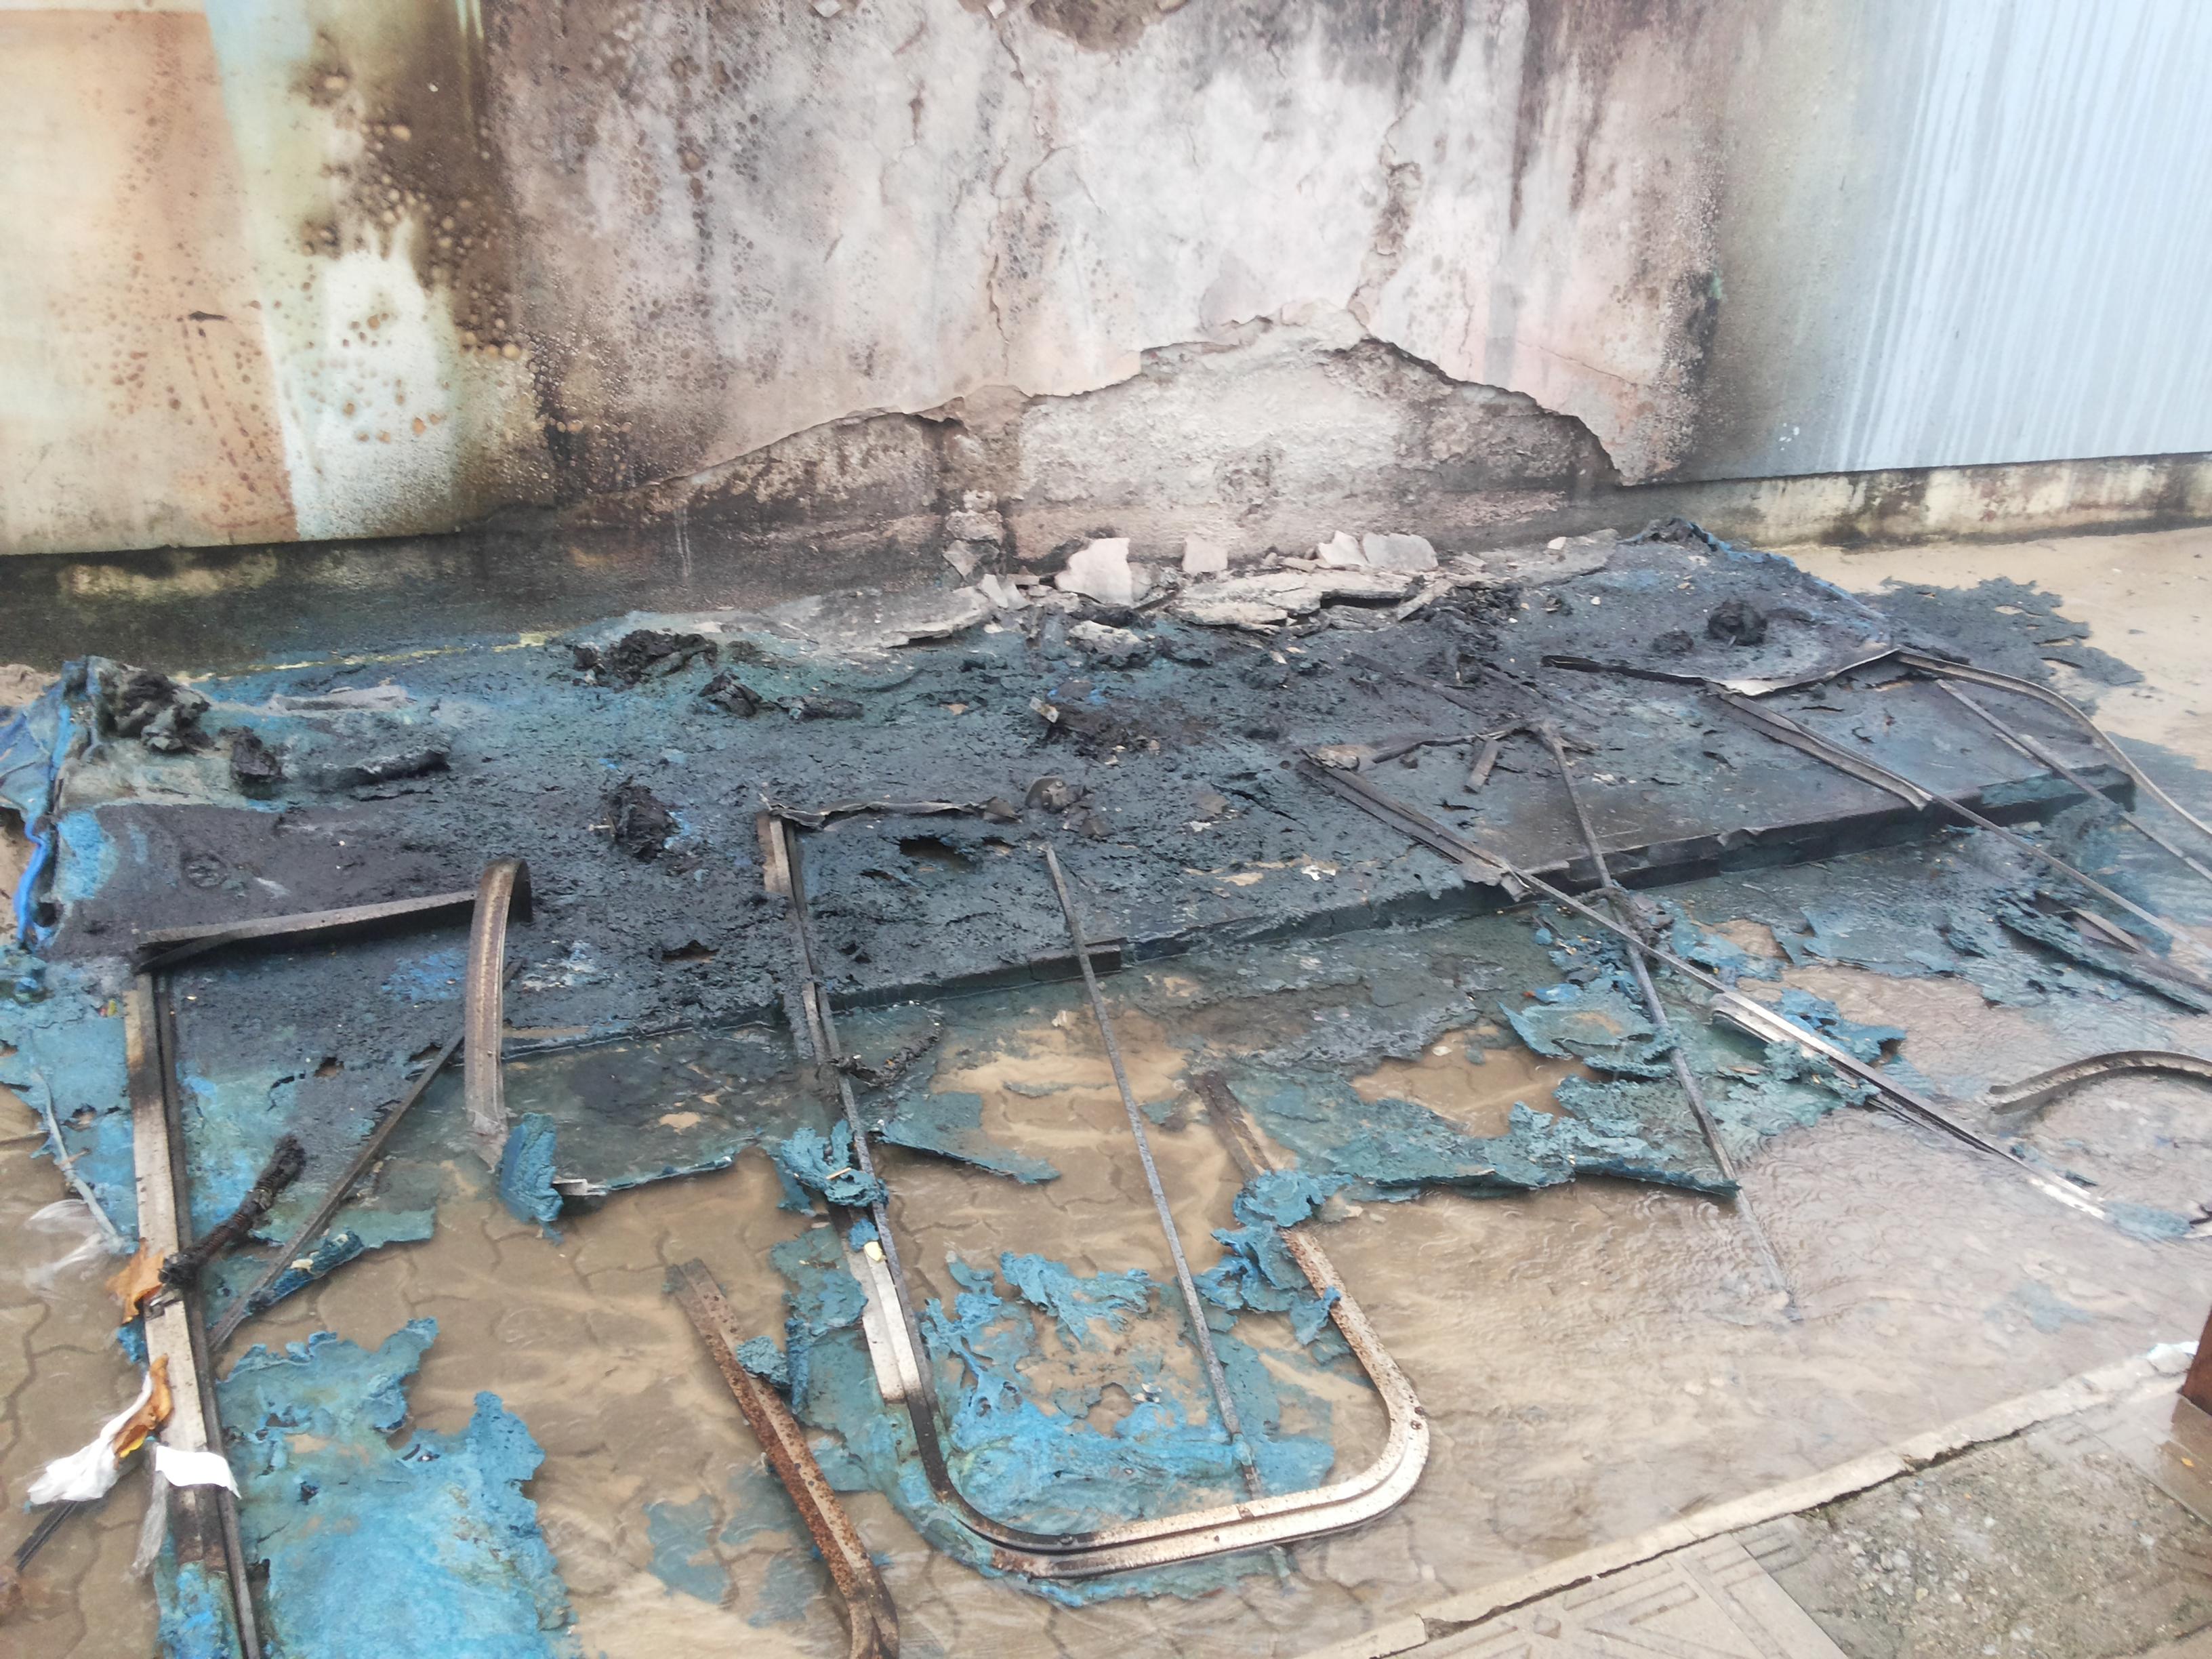 banheiros-incendio-ingleses-vandalismo